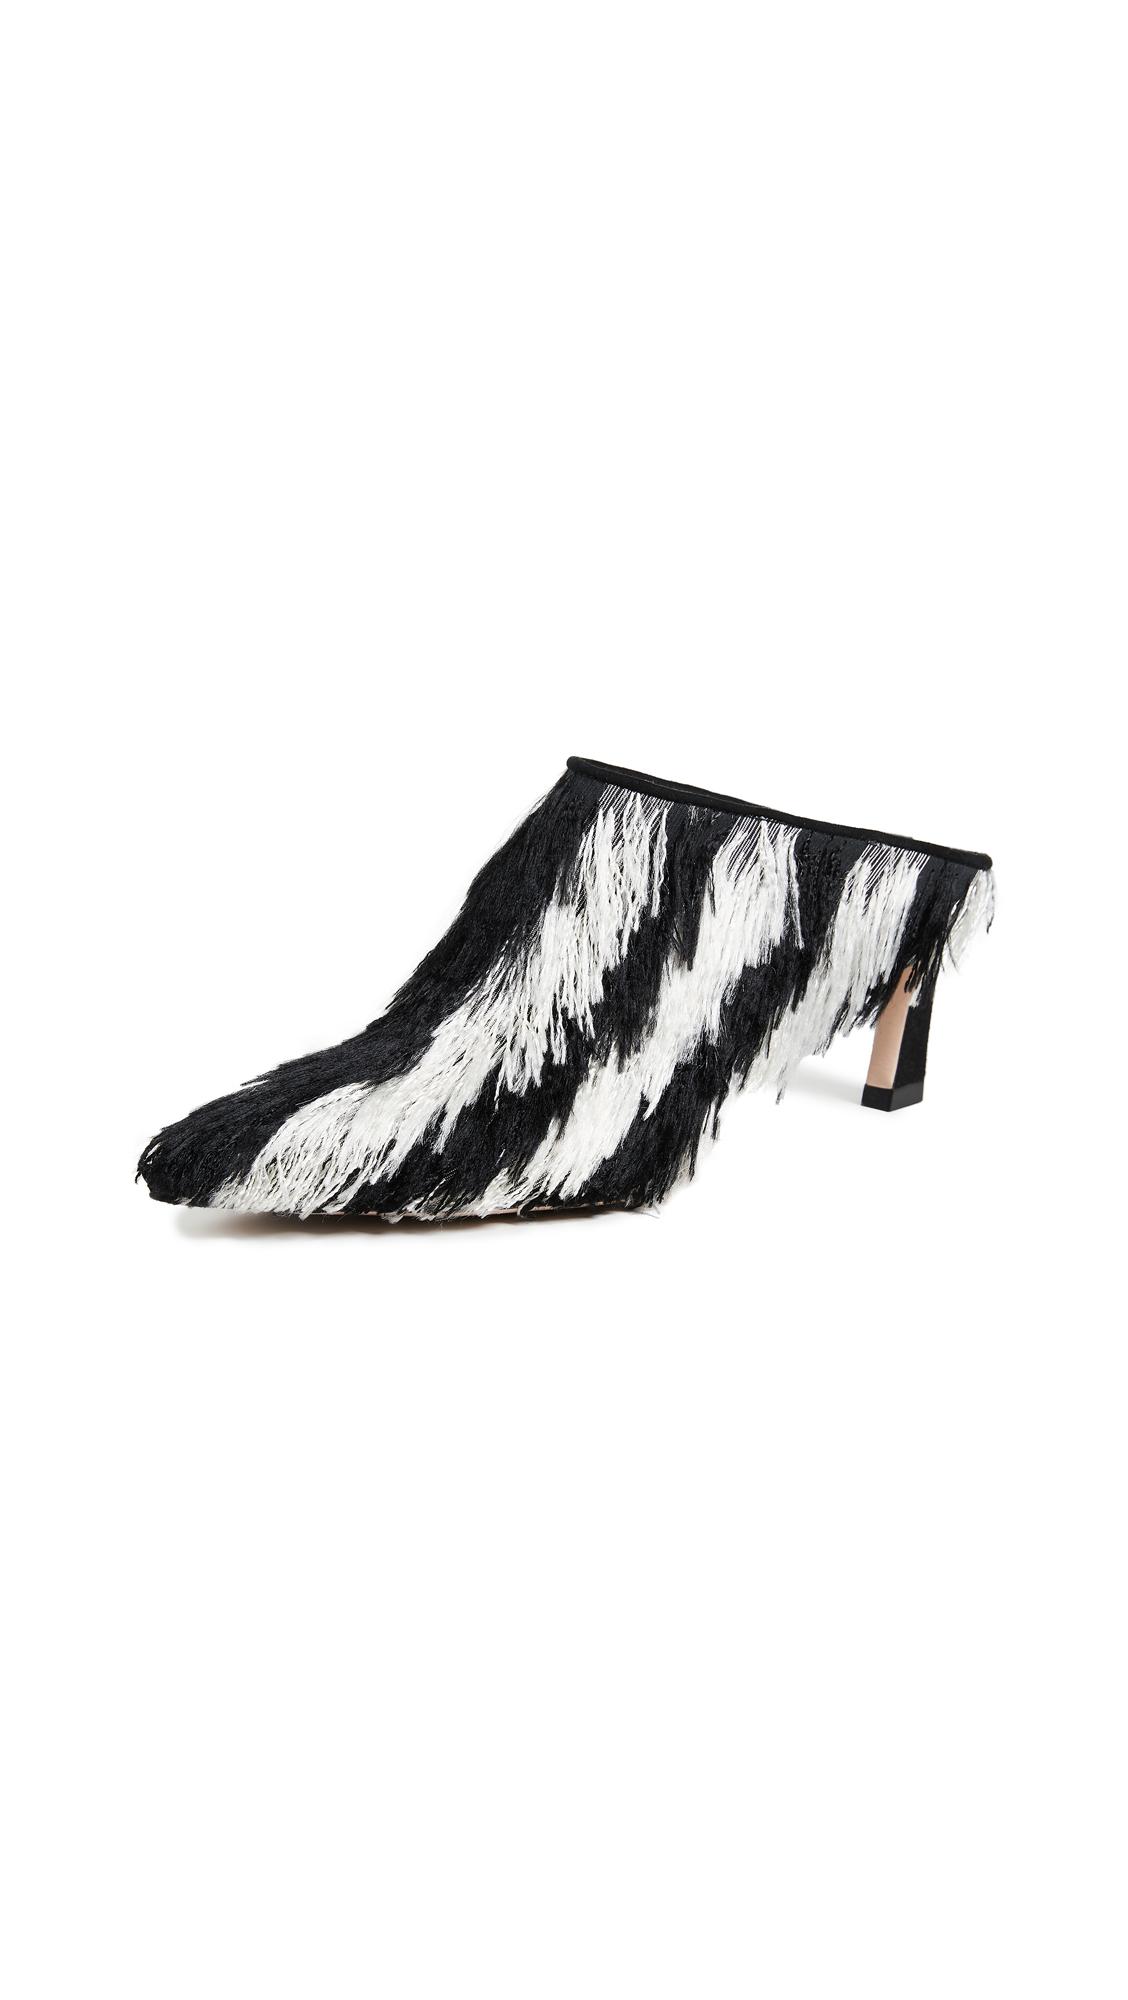 Stuart Weitzman Mira Lashes Mules - Cream Stripe